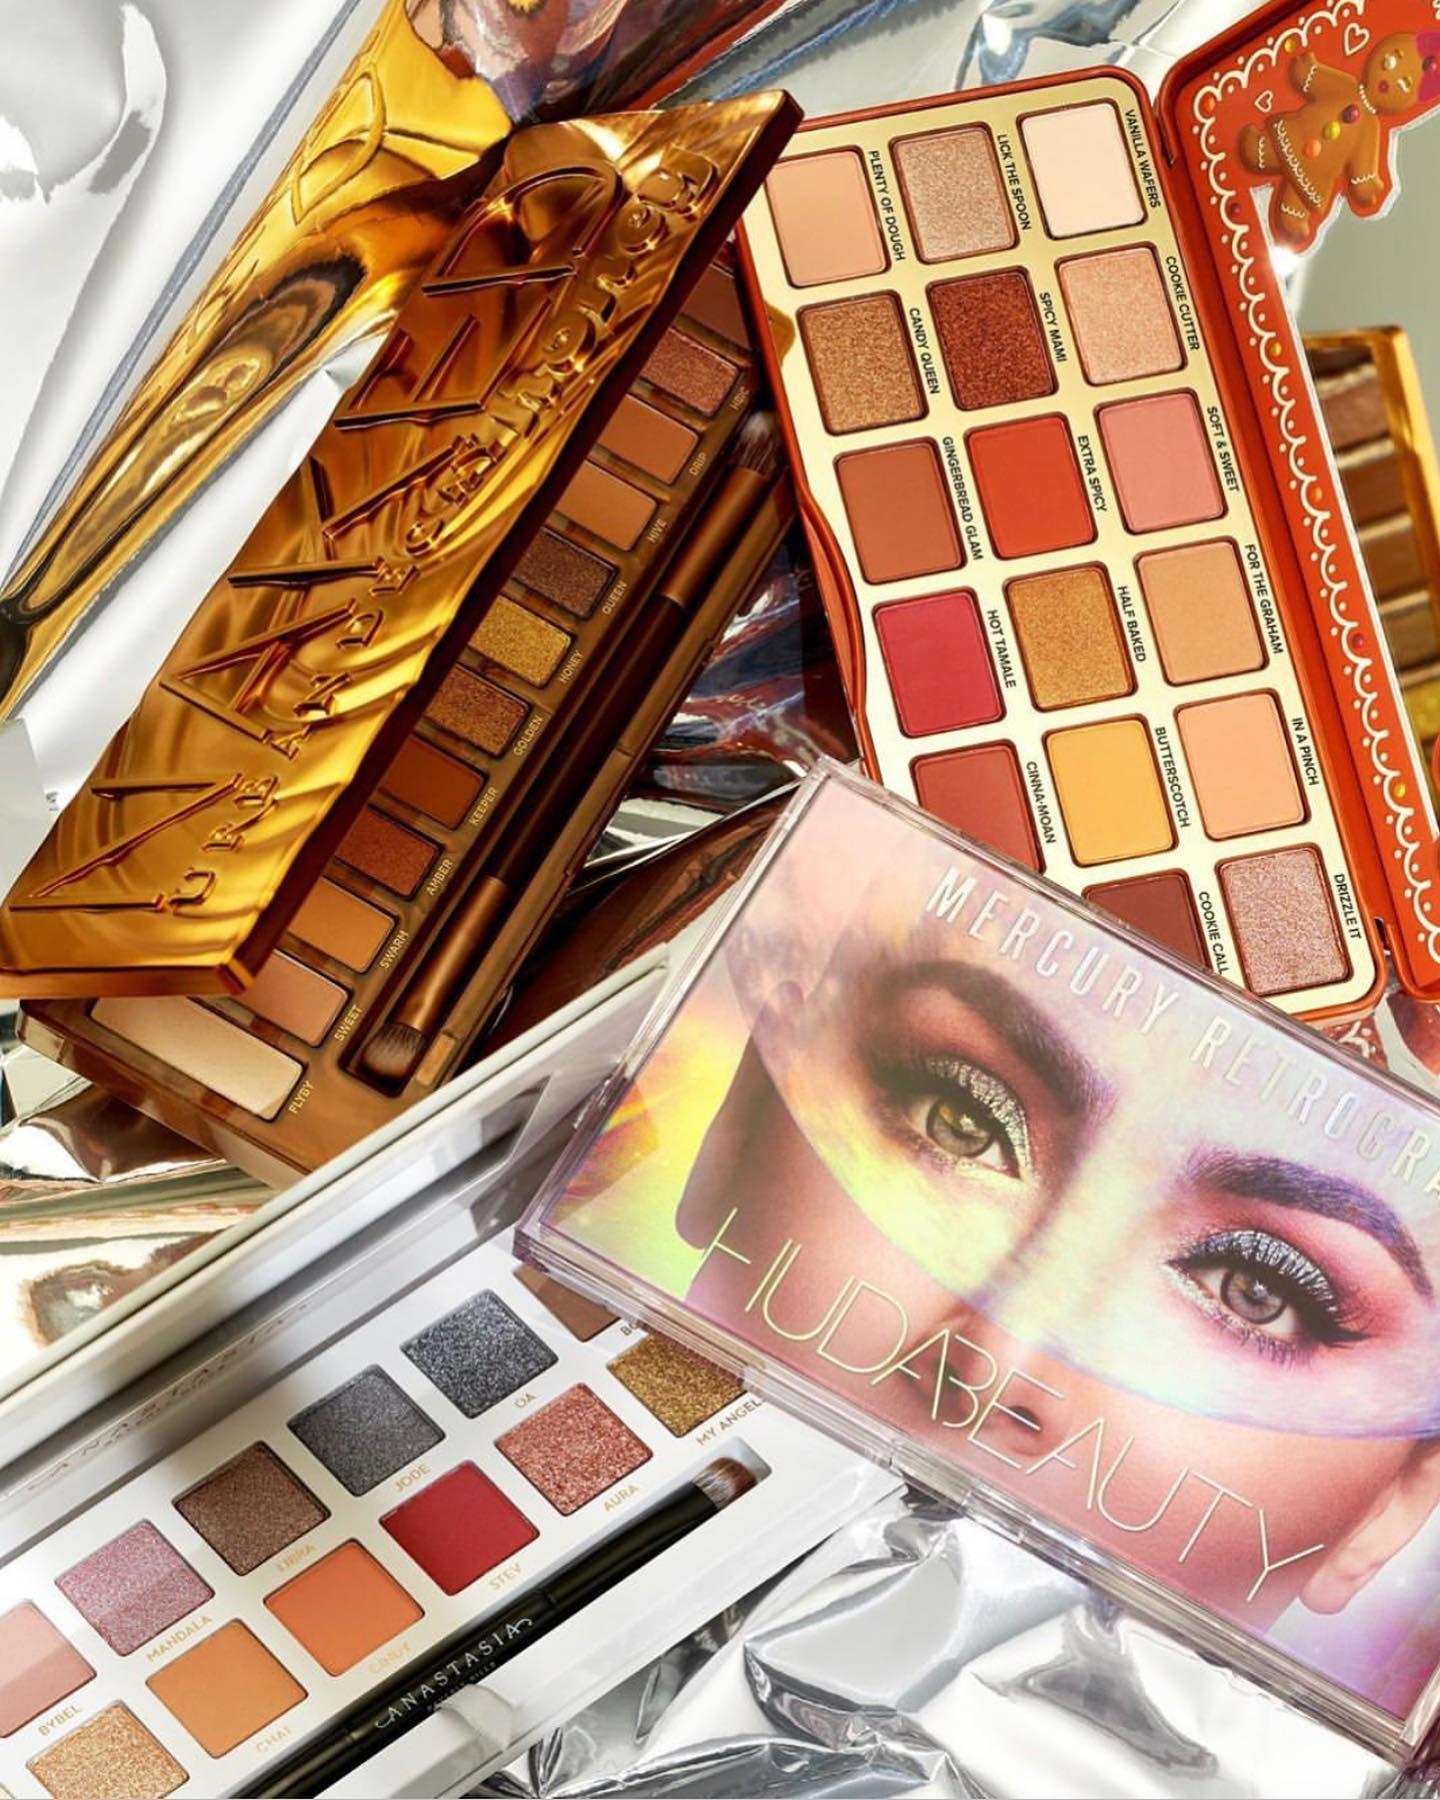 New Me I Top 1 Best Makeup Makeupartist Pic صور مكياج هدايا اصلي موضه عطور دبي السعودية Beauty Perfume Beauty Italian Charm Bracelet